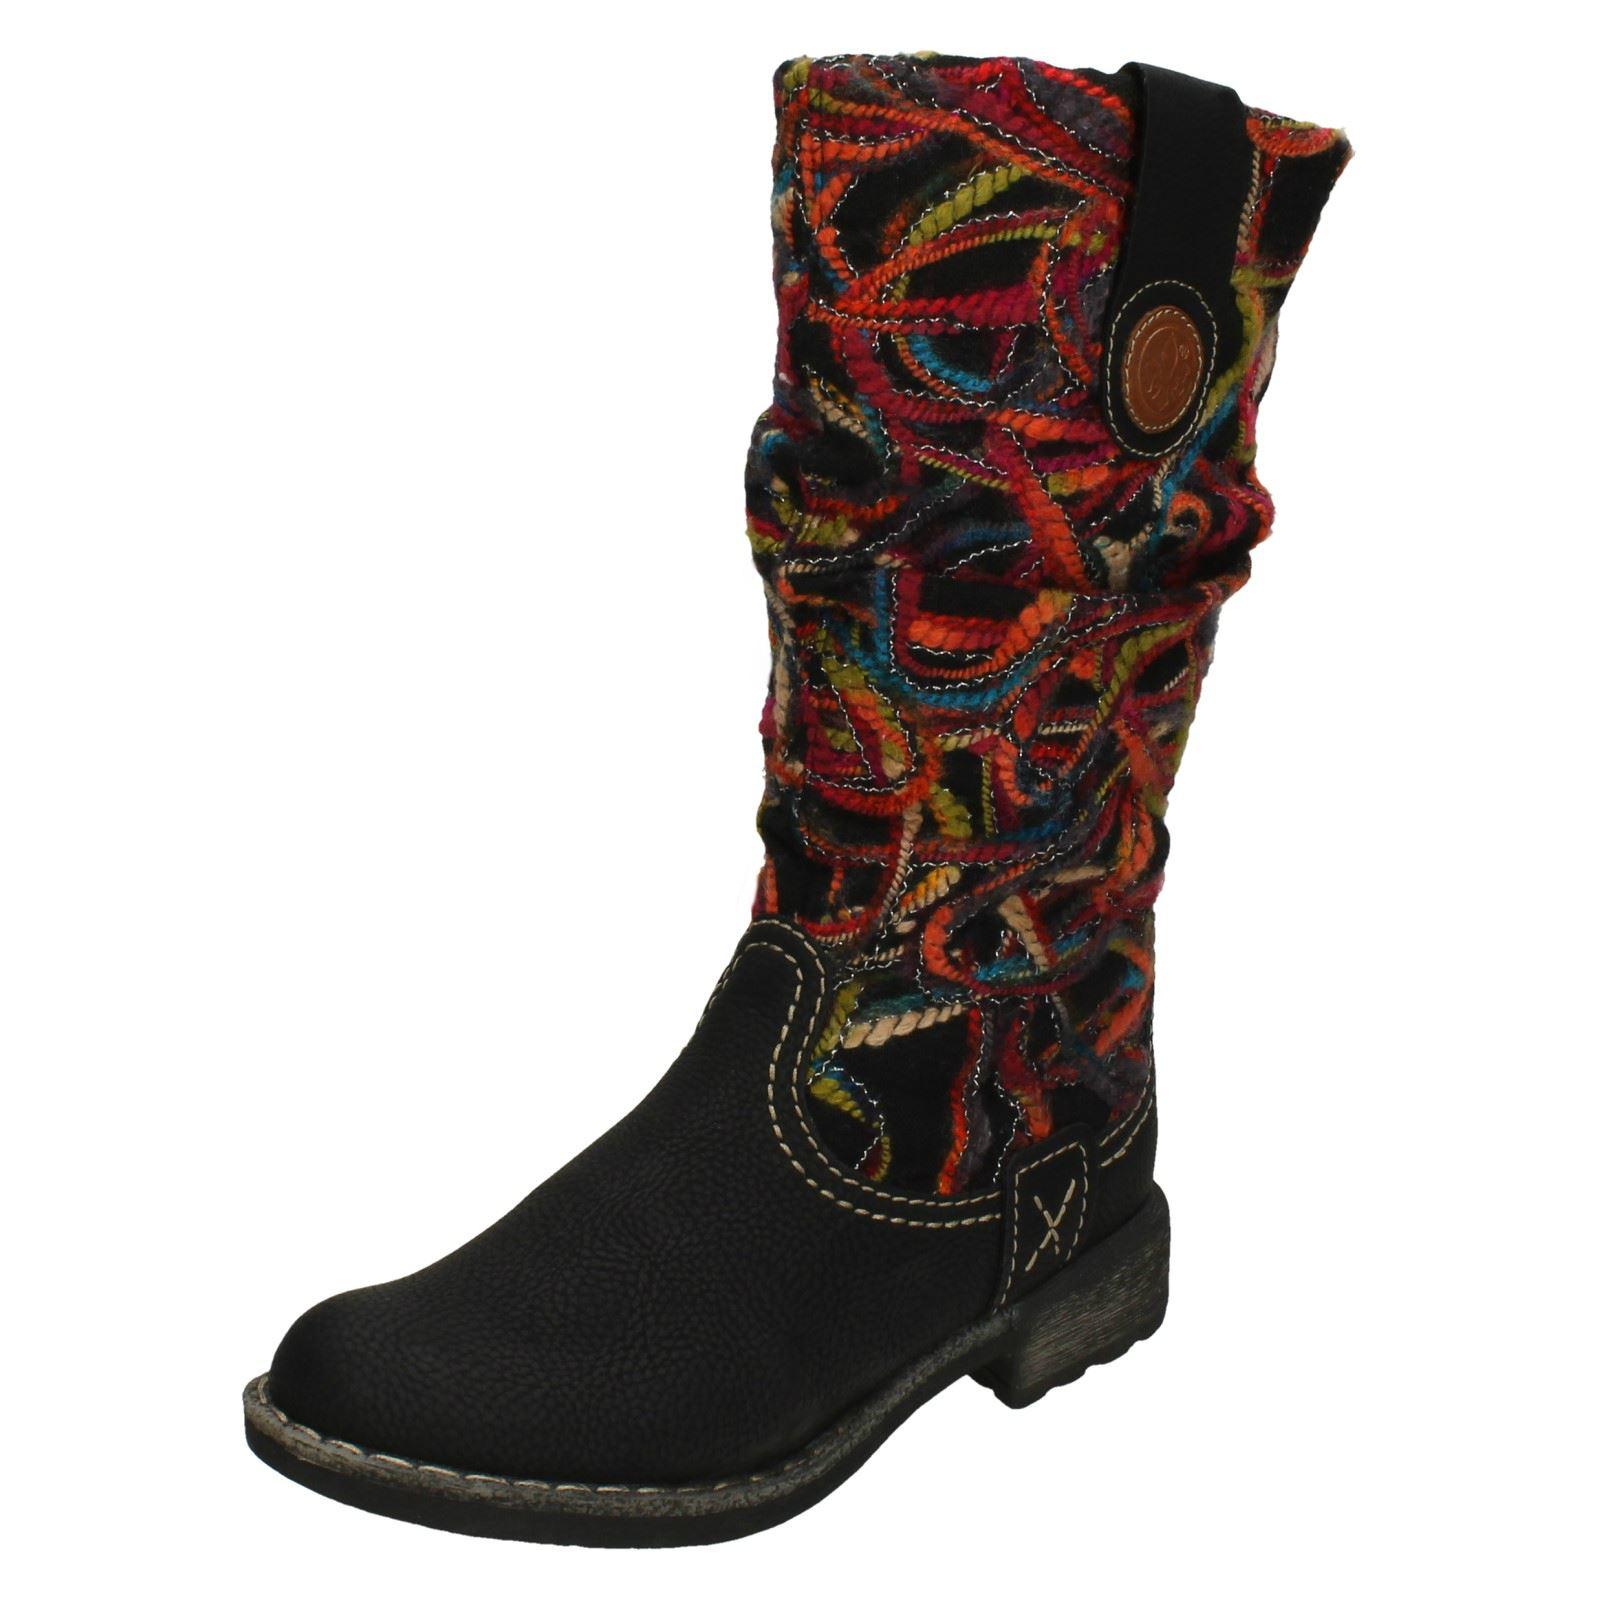 Ladies Rieker Slip On Mid Calf Boots 74663